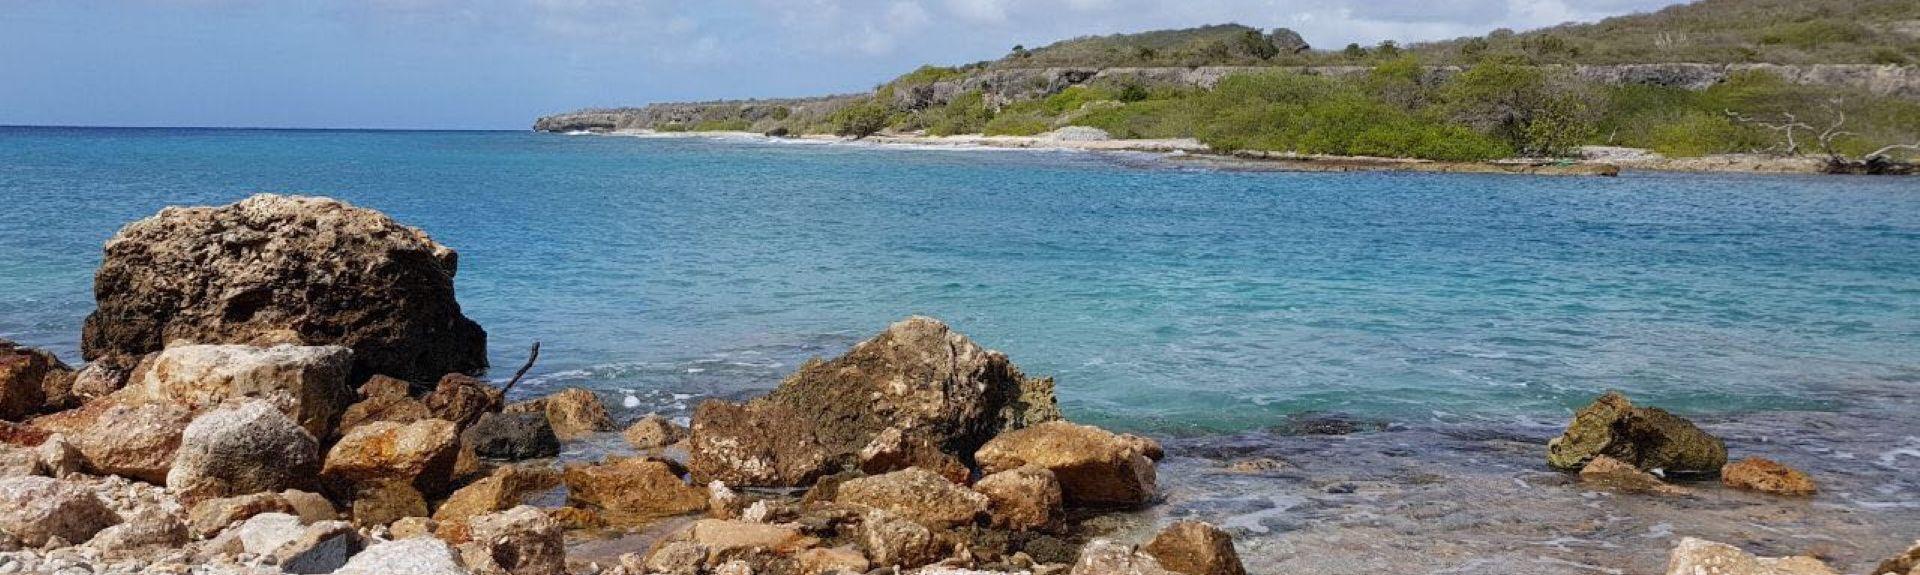 Santa Rosa, Willemstad, Curacao